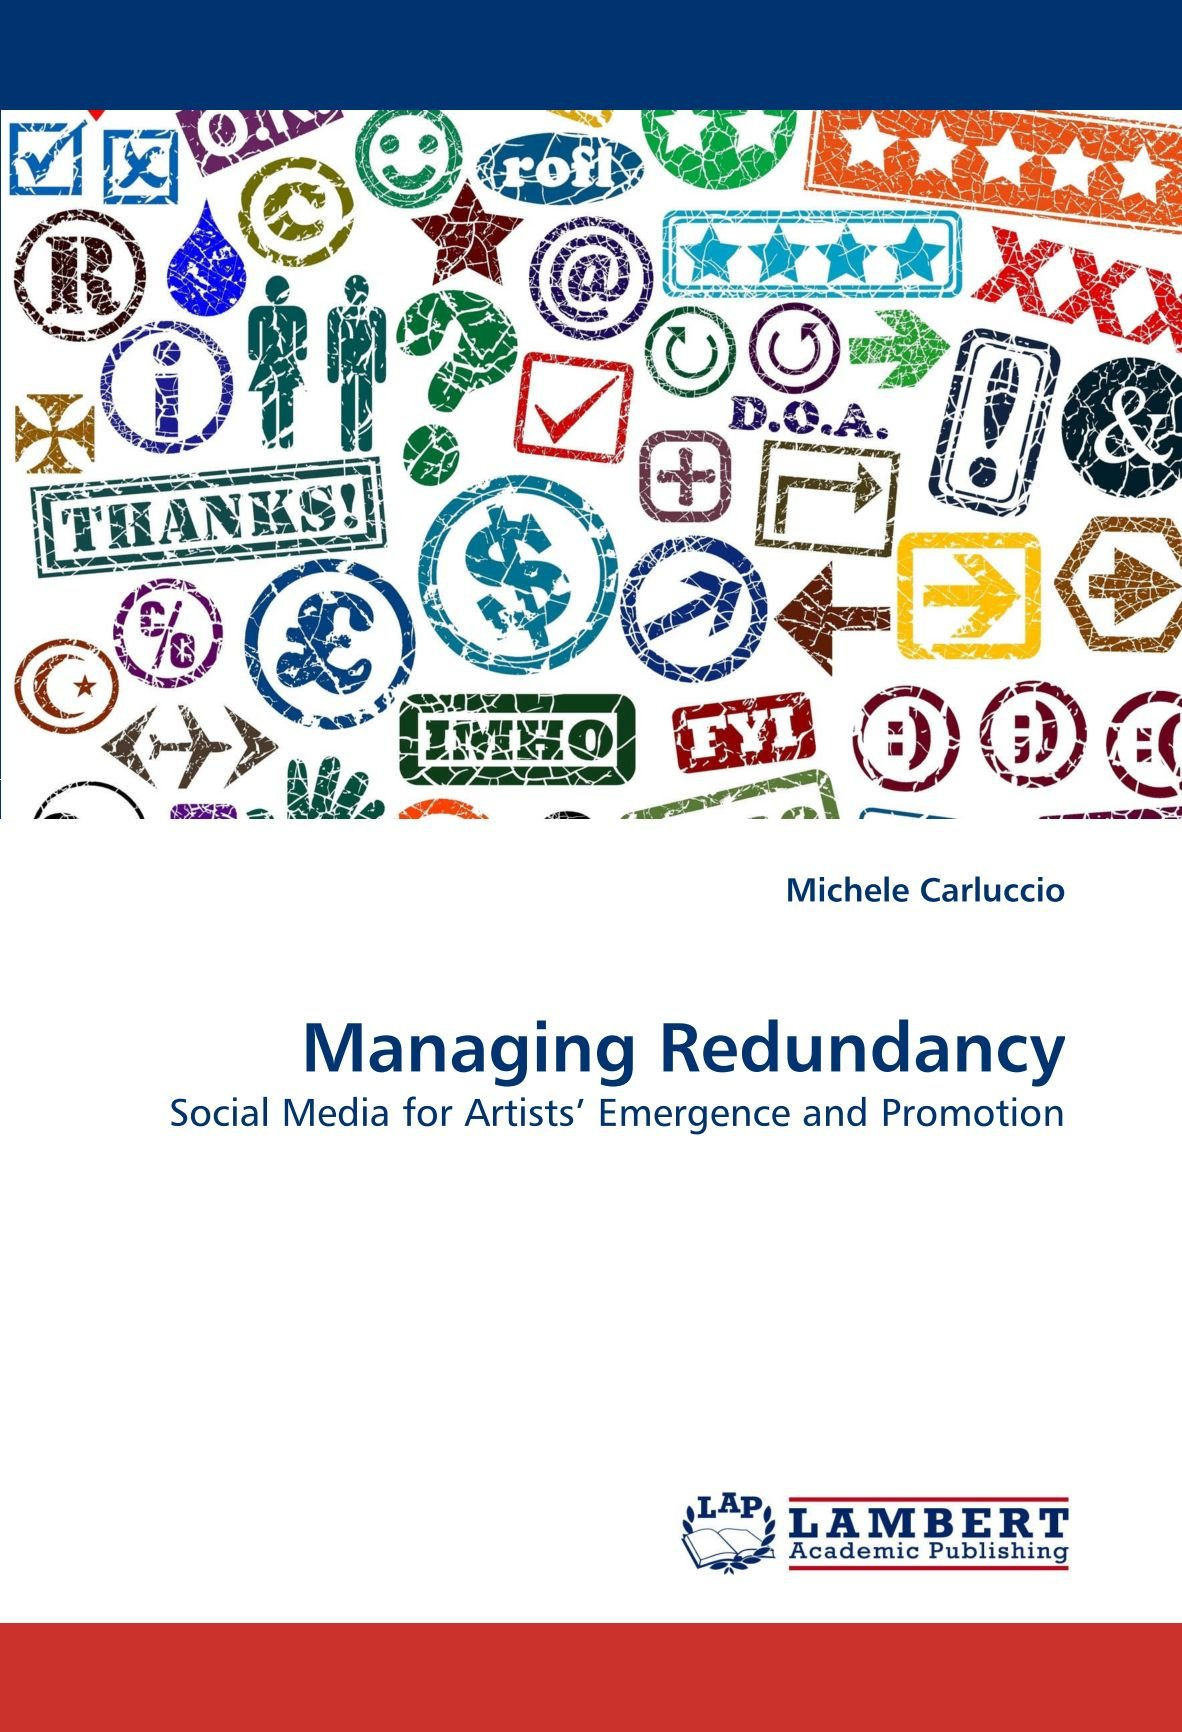 Managing Redundancy: Social Media for Artists' Emergence and Promotion pdf